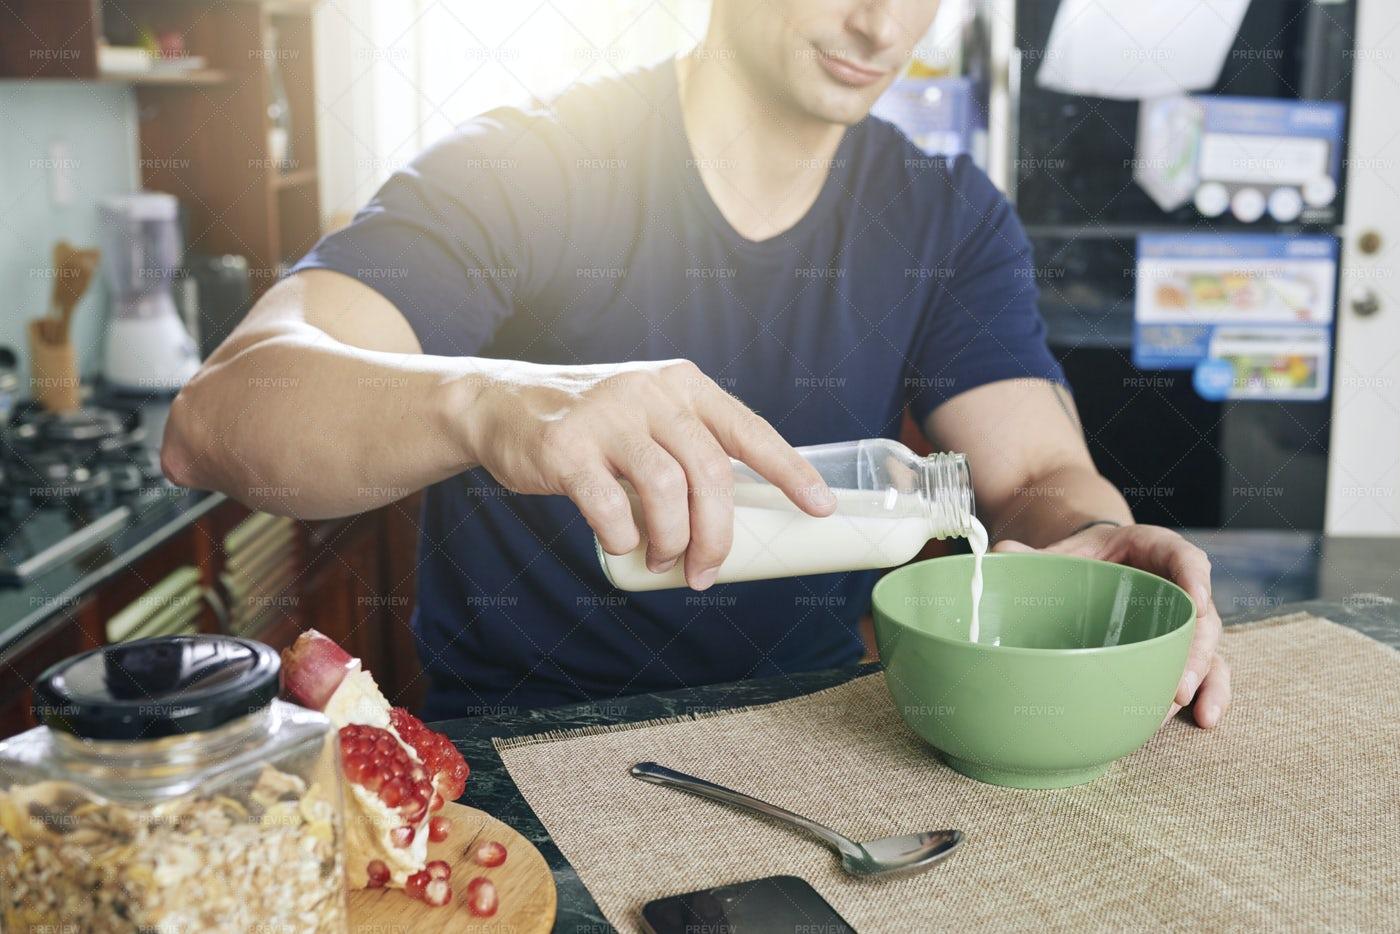 Man Preparing Cereal With Milk: Stock Photos